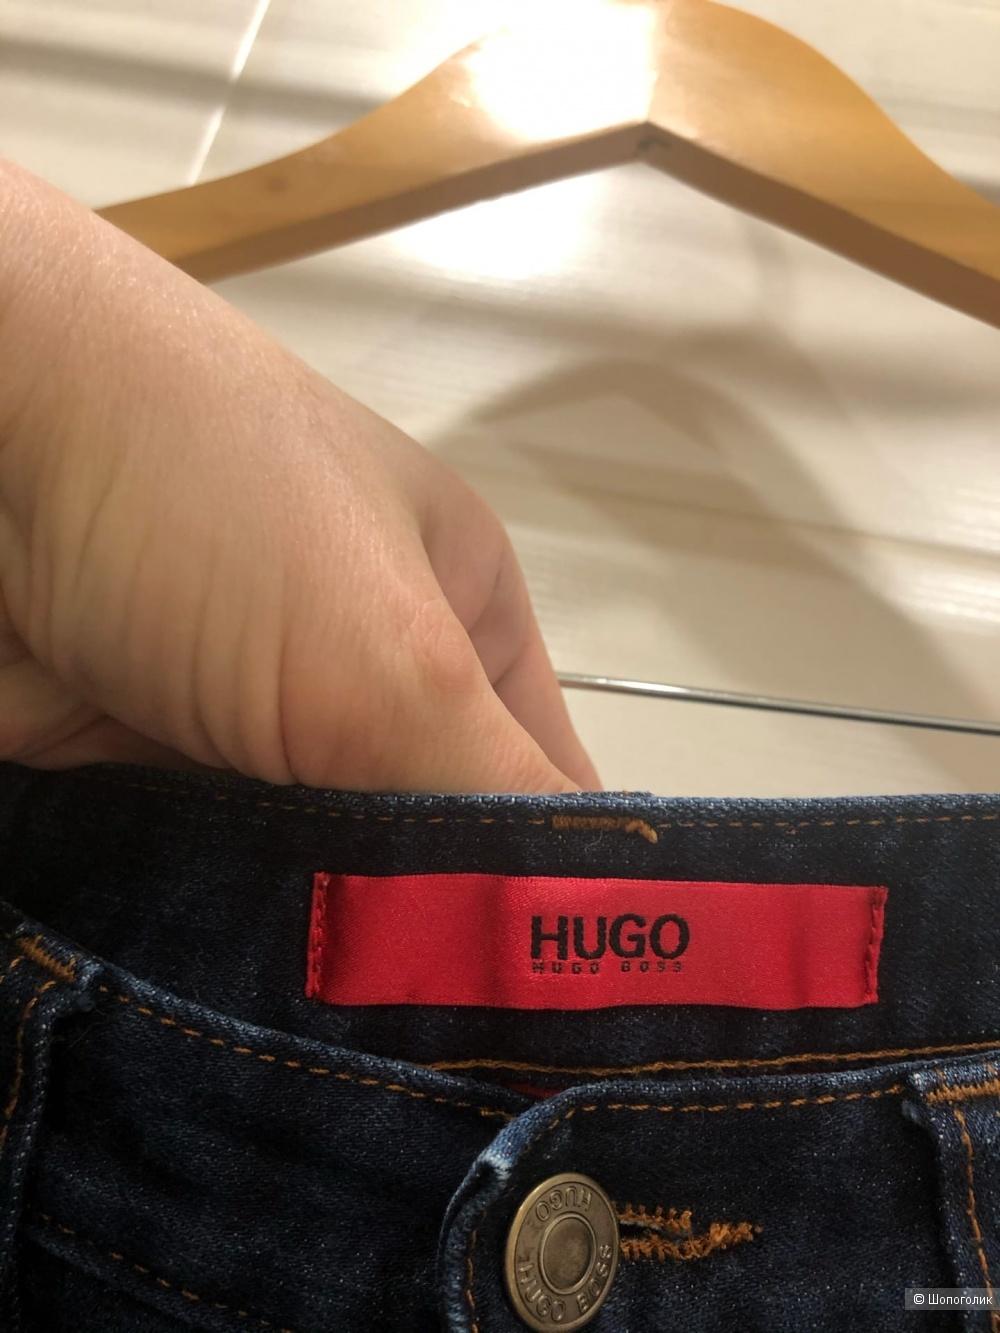 Джинсы  BOSS HUGO BOSS.Размер IT31/32.